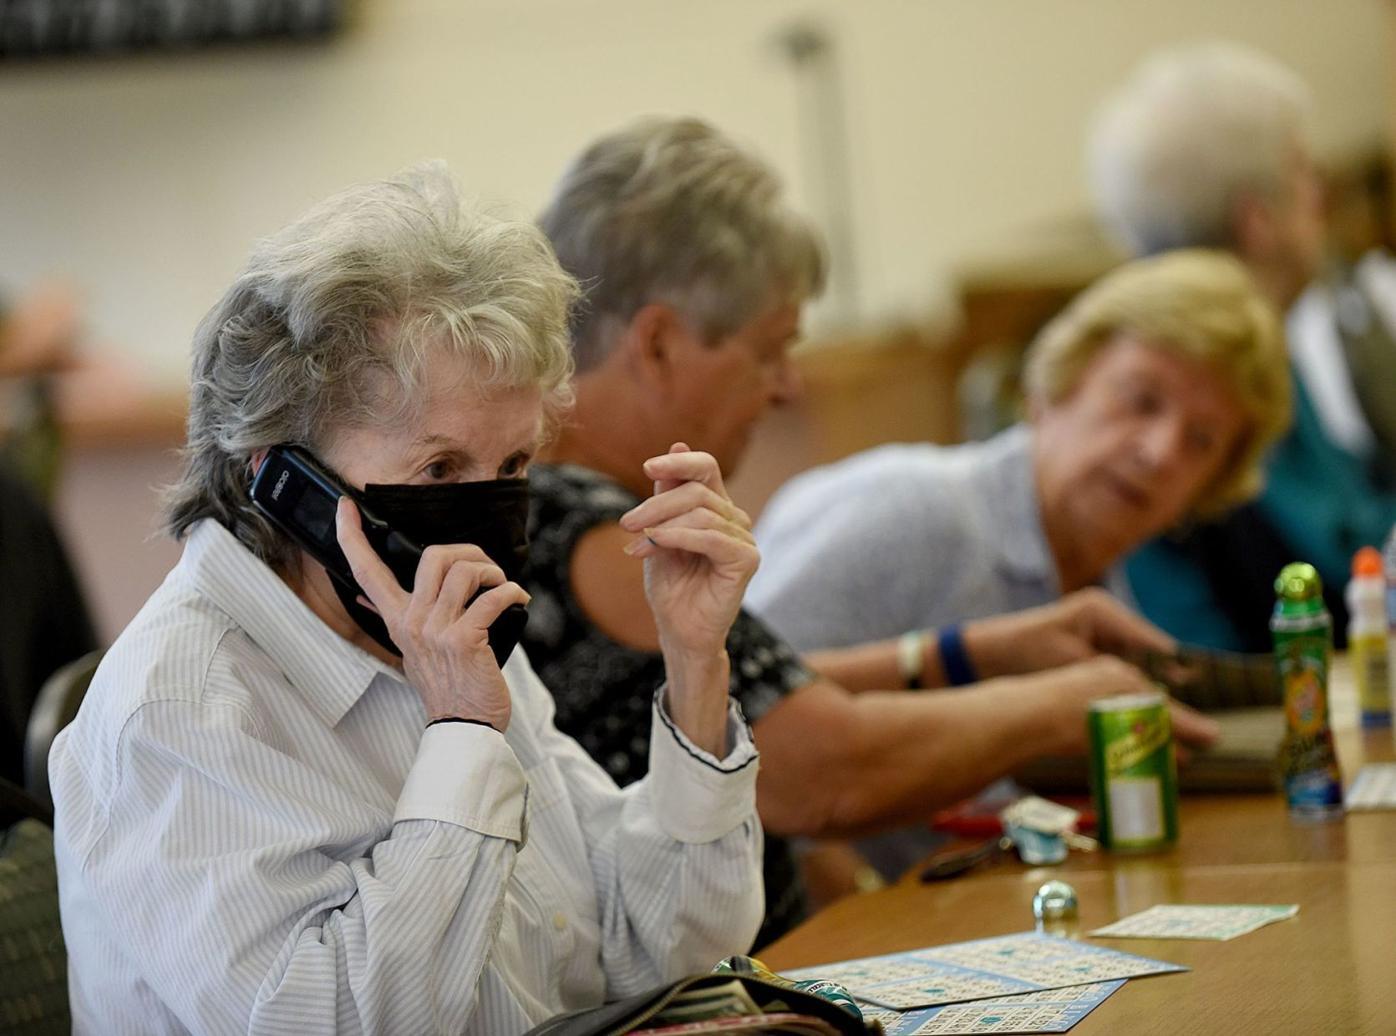 Flip-phone call